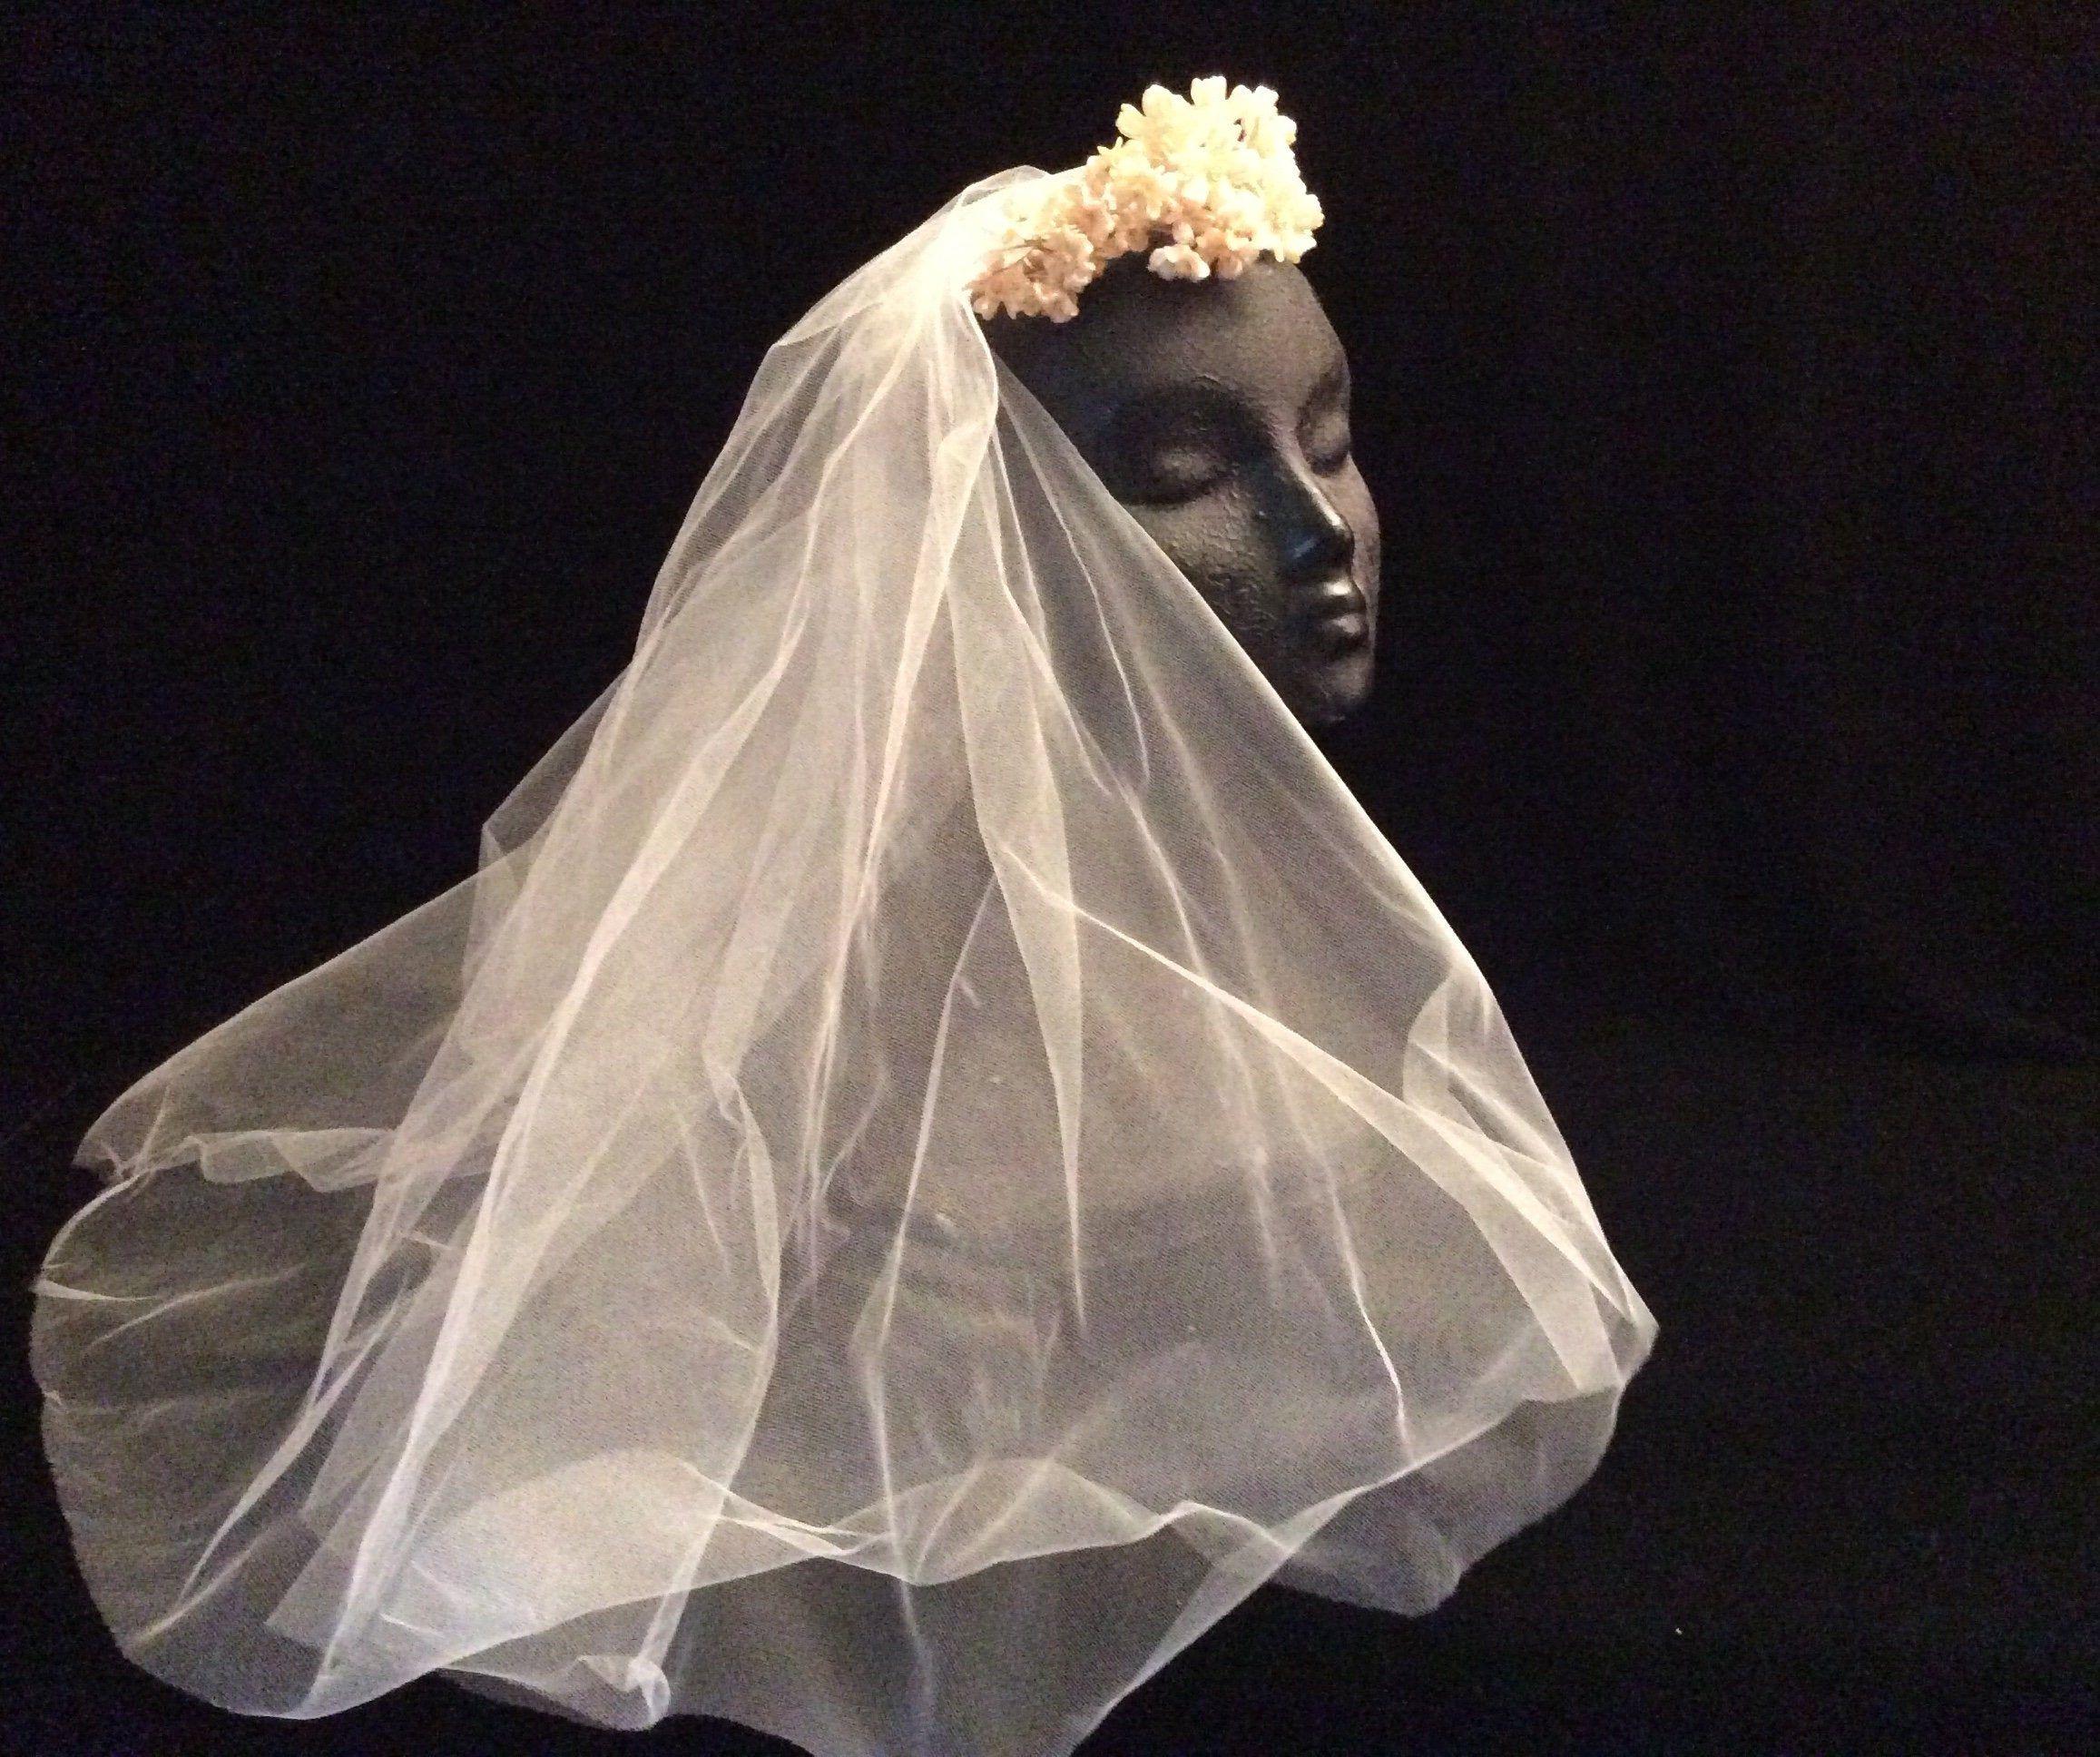 Antique Wax Flowers On Tulle Bridal Veil Vintage Wax Flowers Vintage Wedding Veil With Wax Vintage Veils Bridal Bridal Veils And Headpieces Tulle Bridal Veil